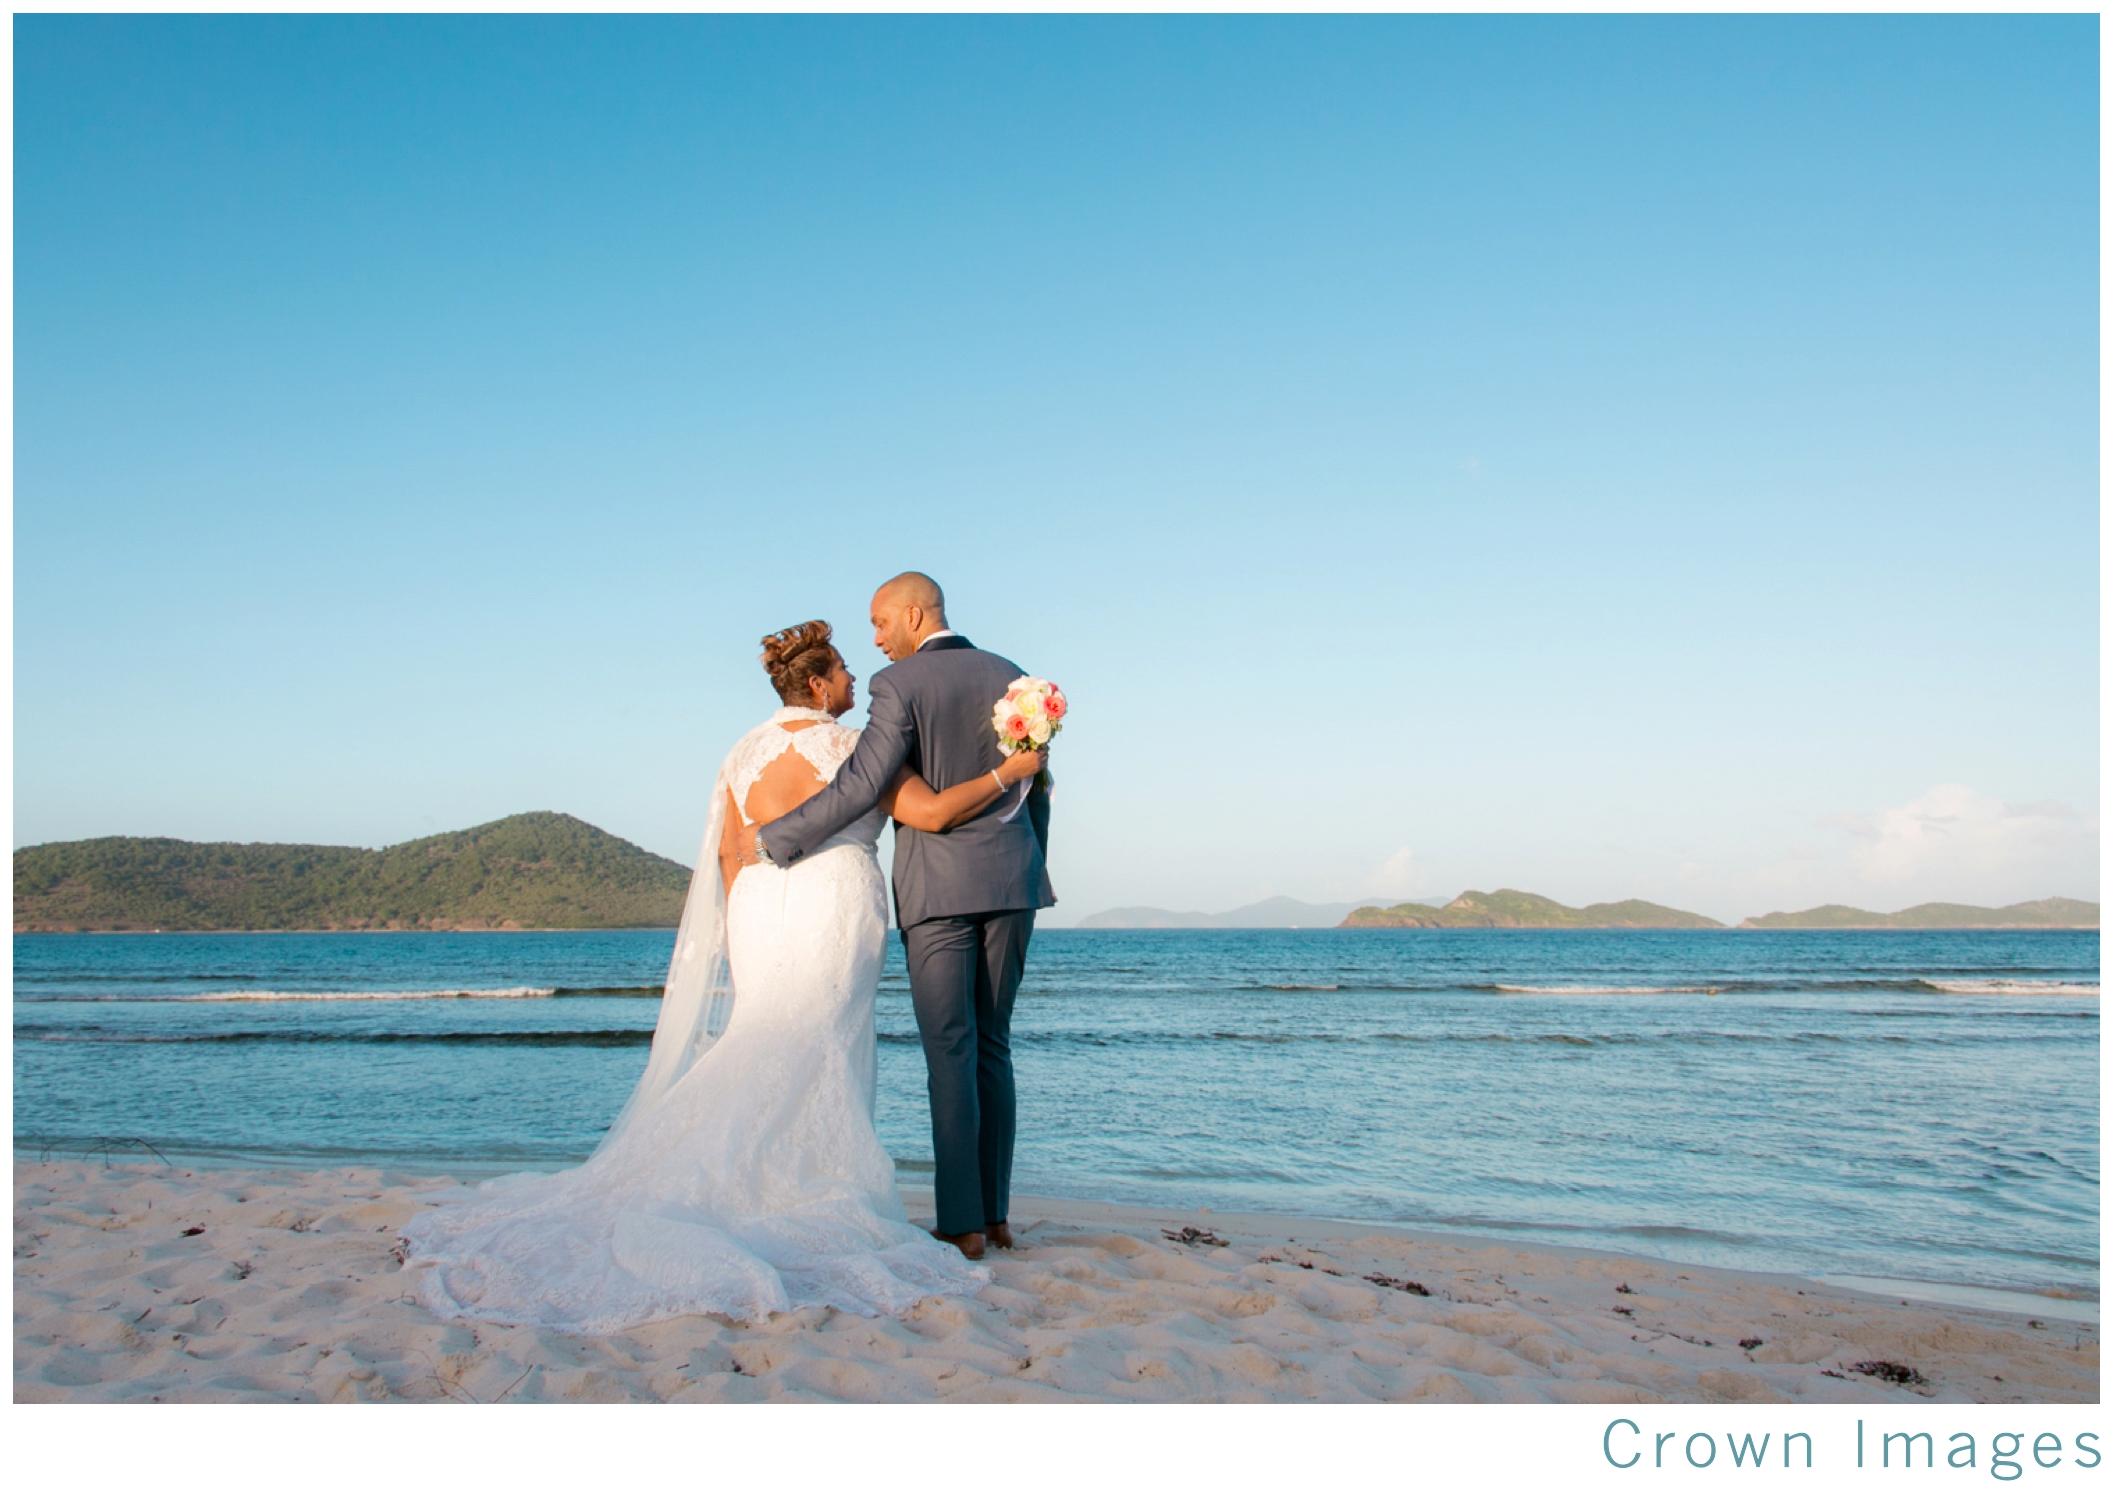 st-thomas-wedding-photographer_1085.jpg